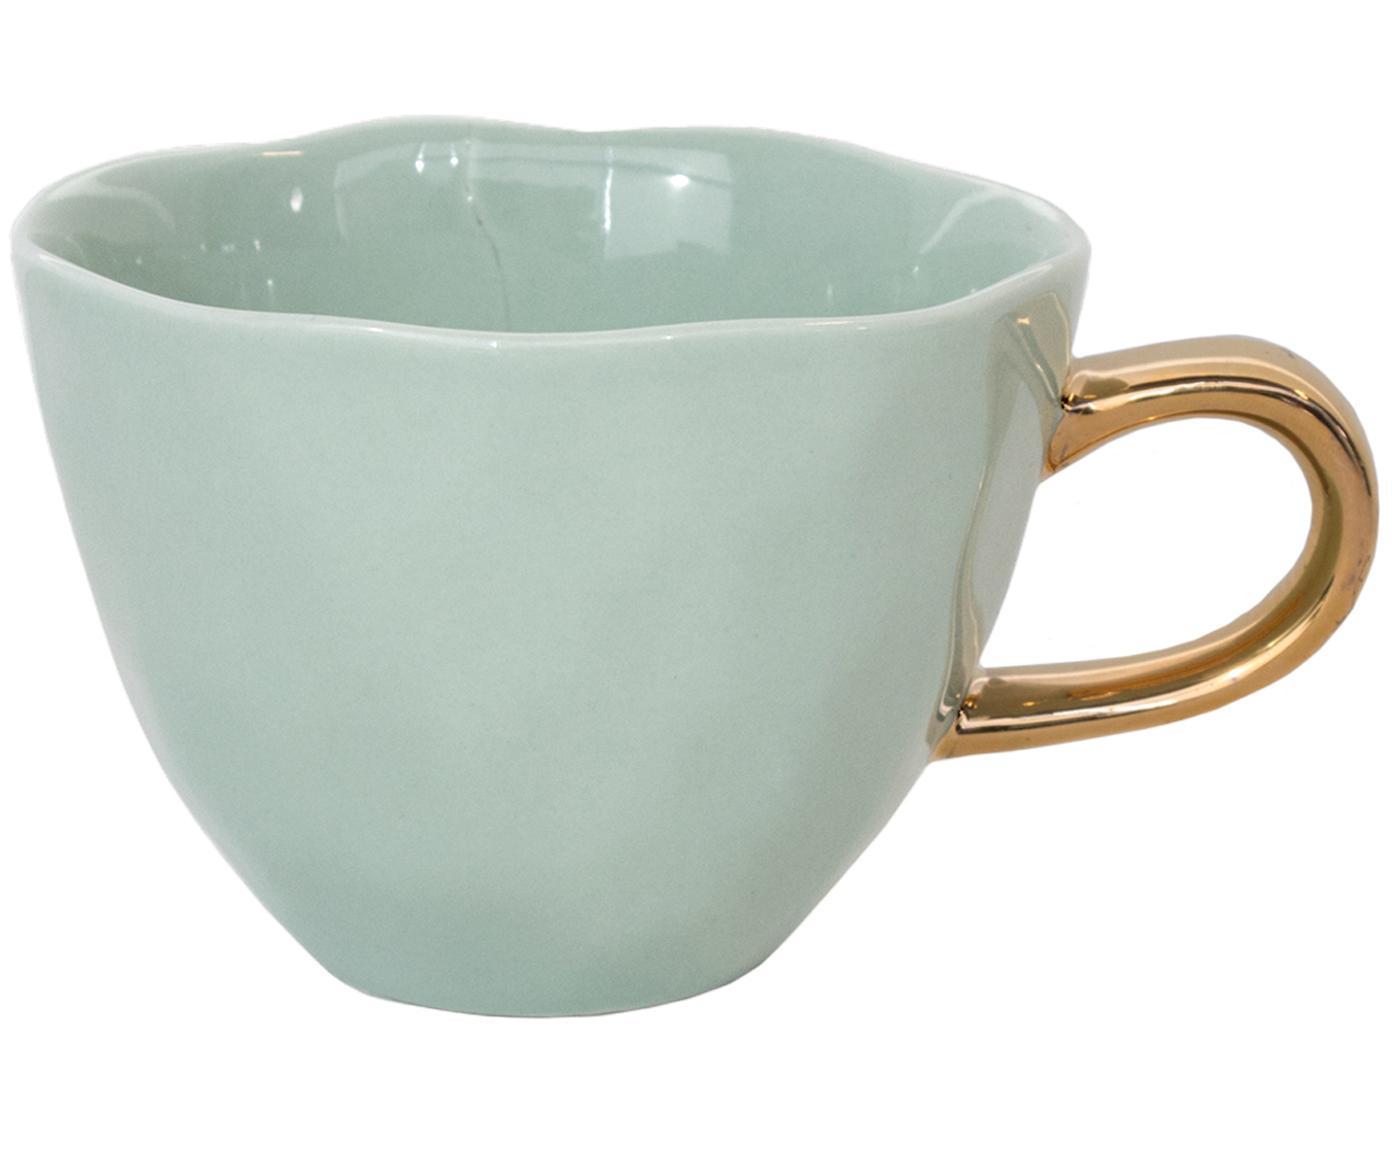 Tazza con manico dorato Good Morning, Terracotta, Verde menta, dorato, Ø 11 x Alt. 8 cm